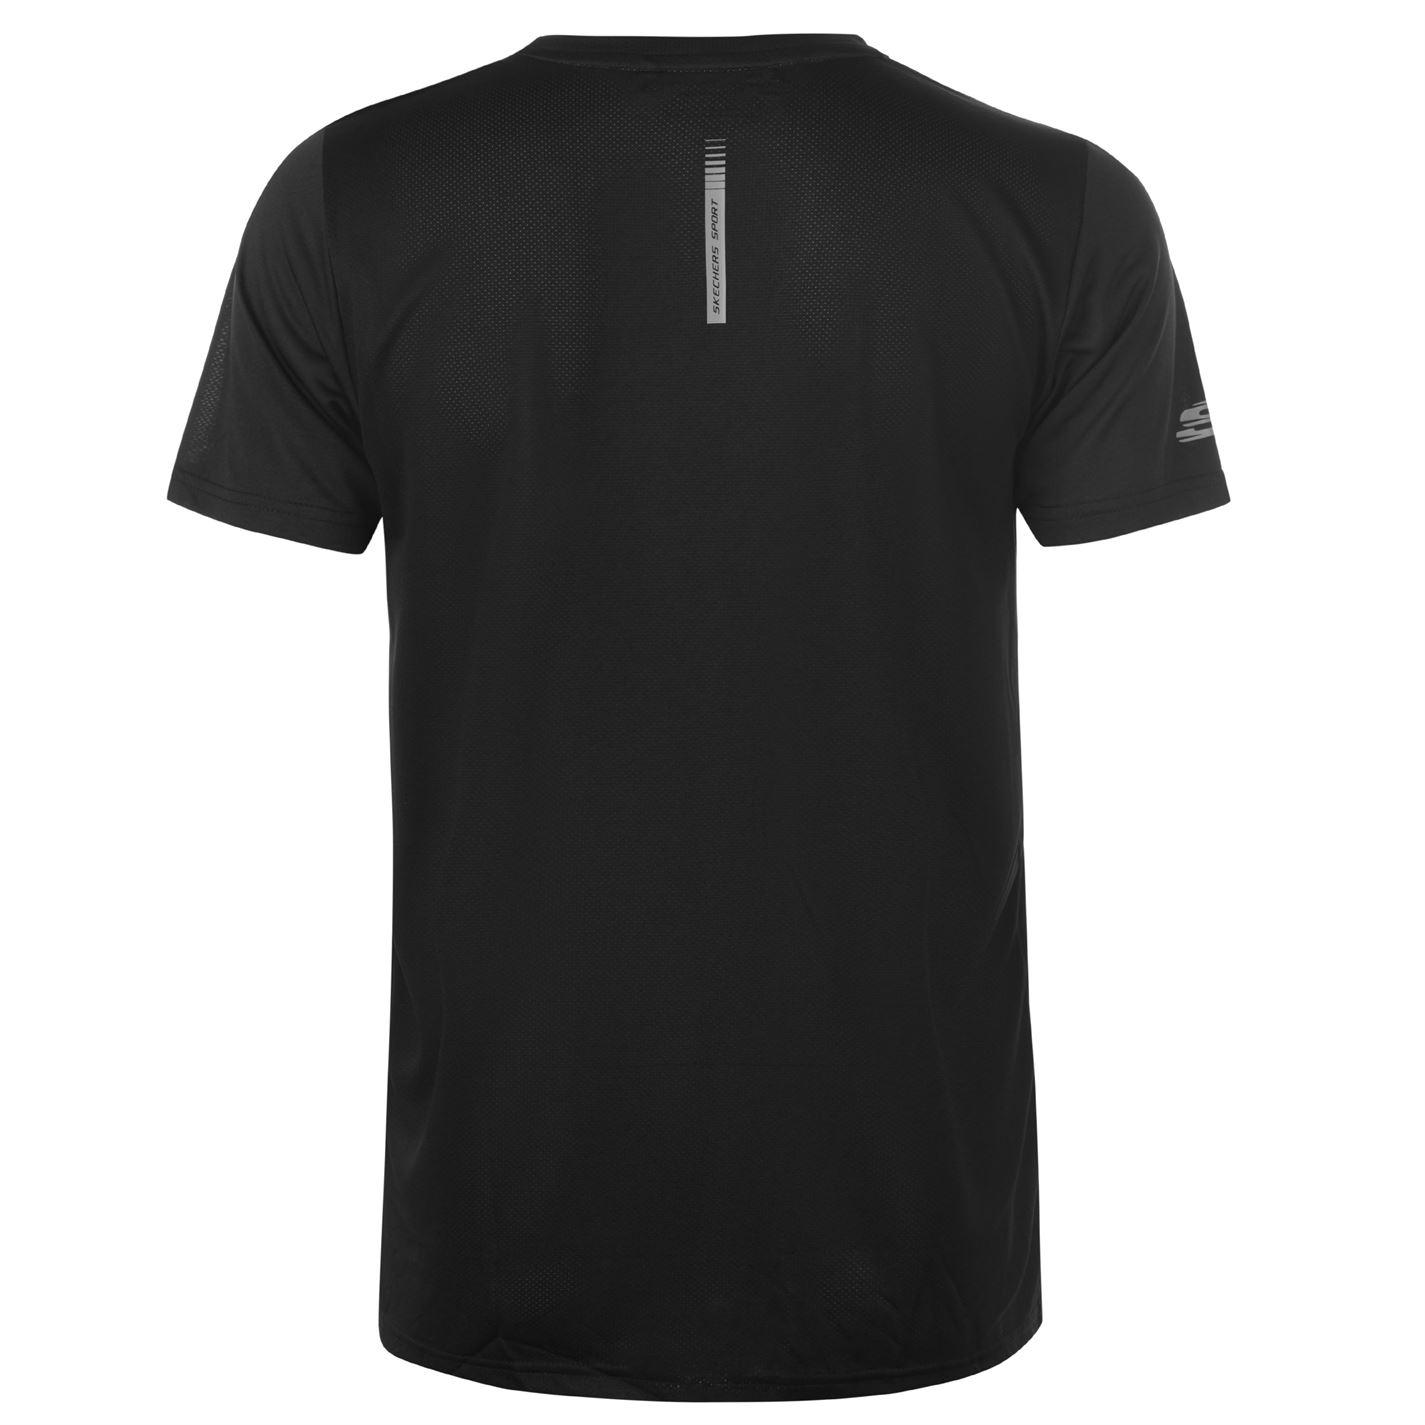 Skechers-Mens-Rendimiento-Grafico-camiseta-Manga-Corta-Camiseta-Top-Cuello-Redondo miniatura 9